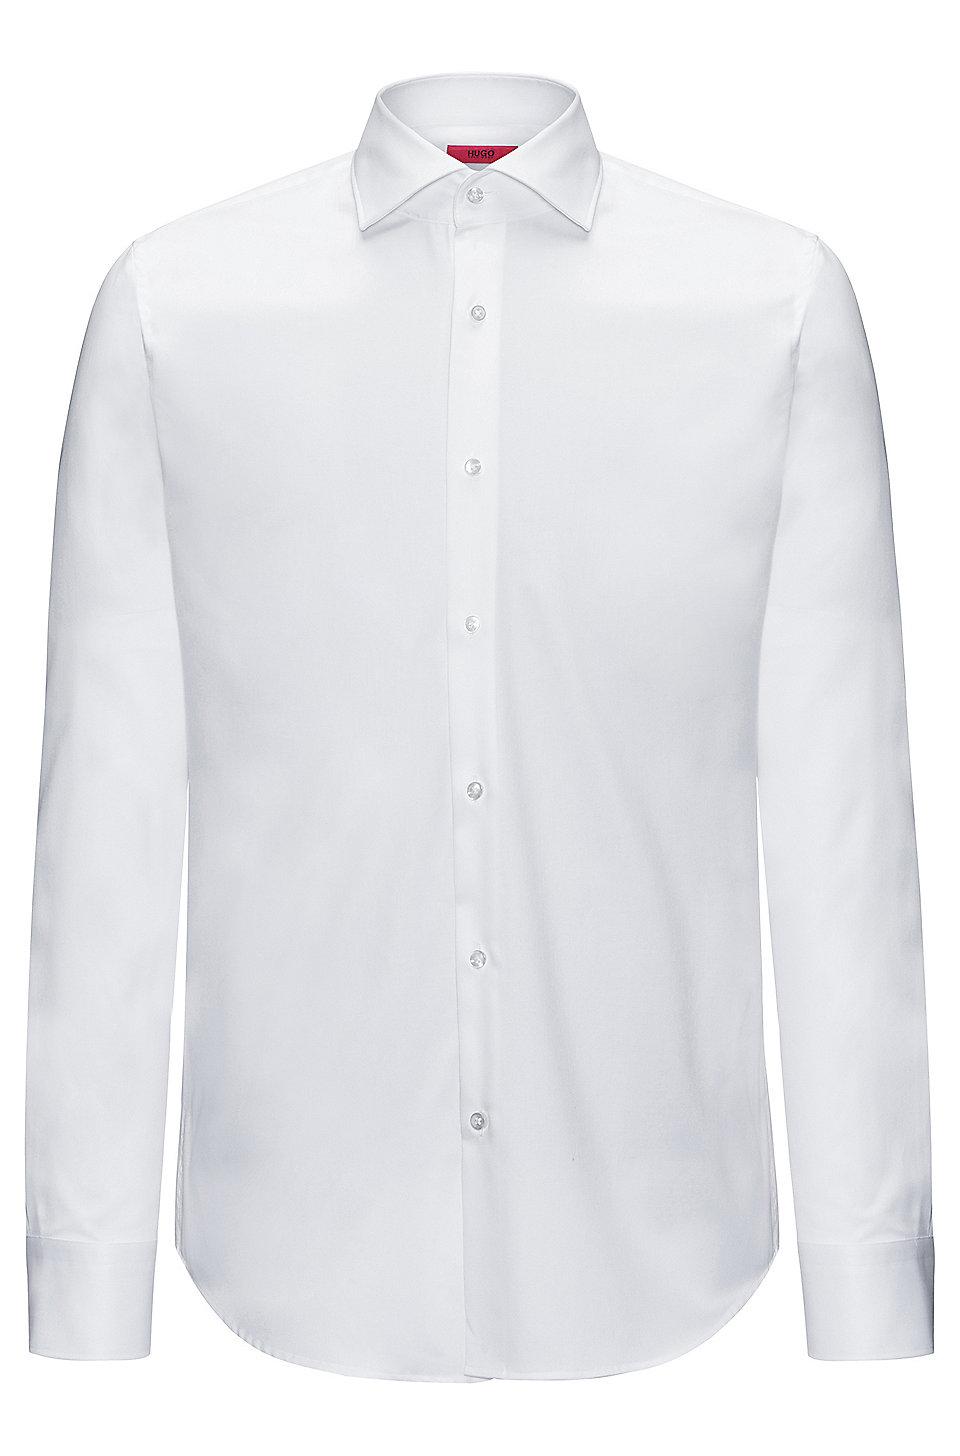 b79aabd2 HUGO - Regular-fit shirt in pure cotton